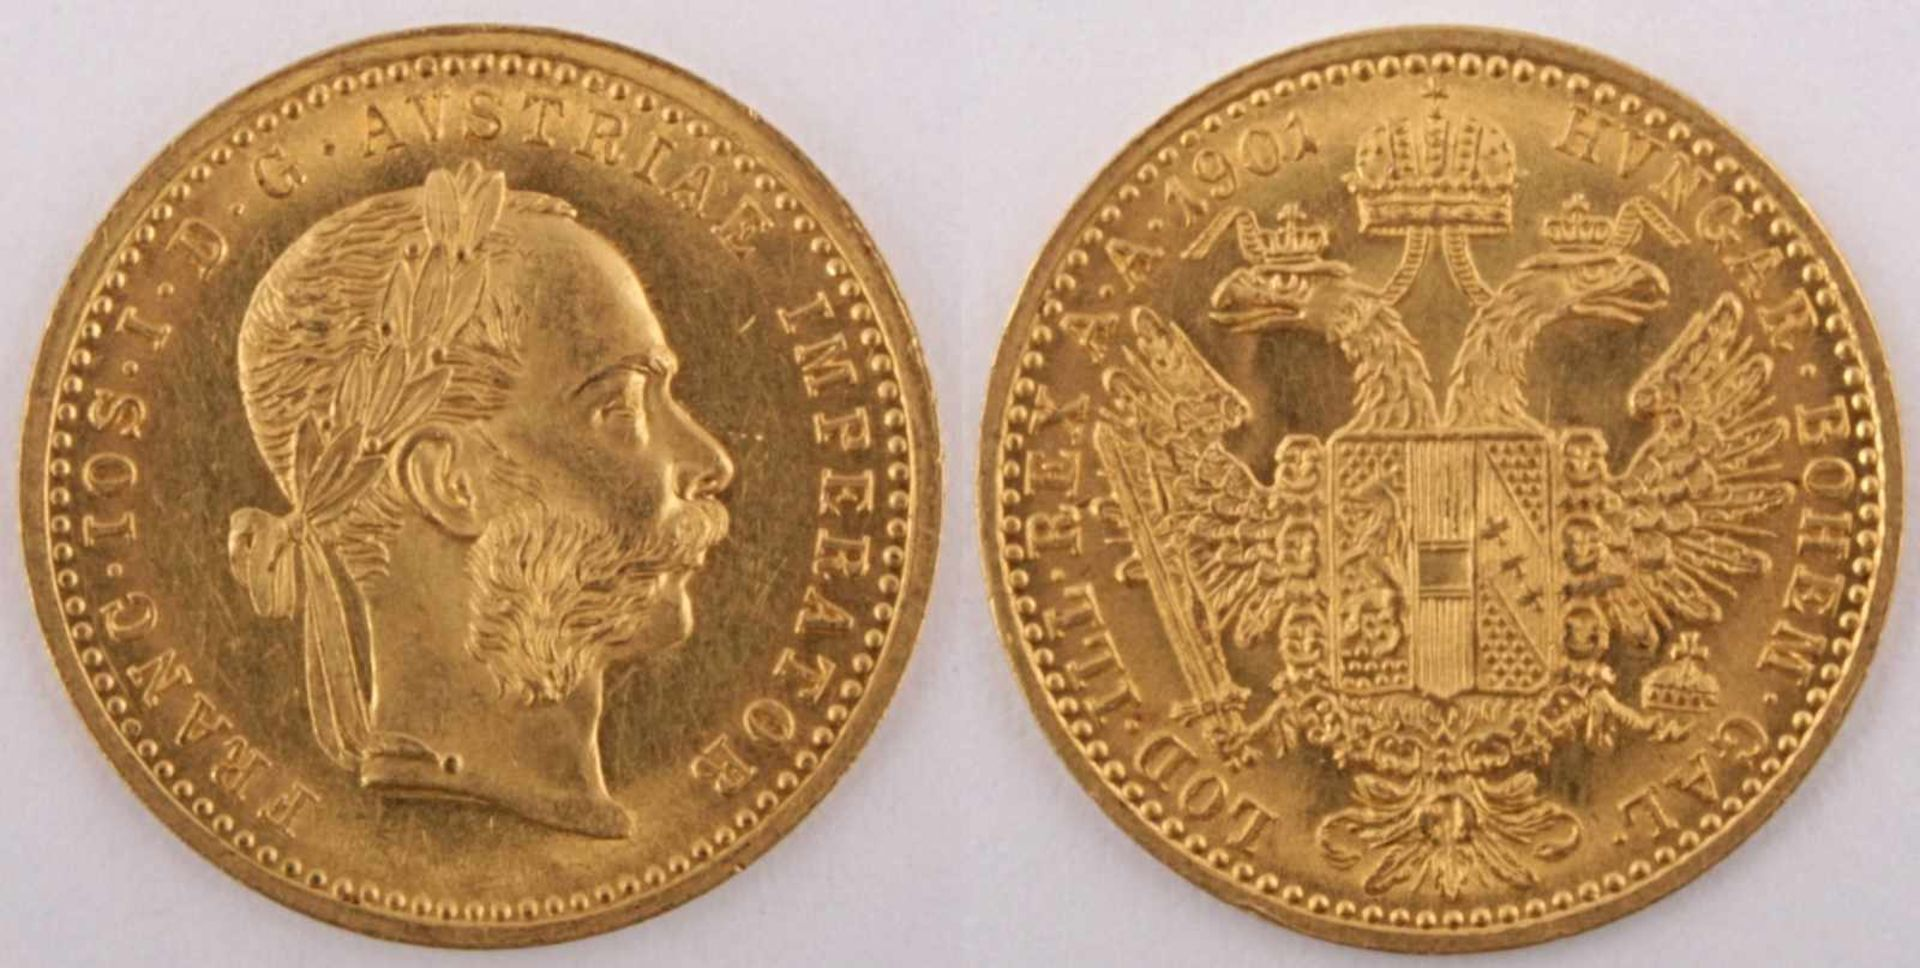 Los 2 - Gold coin: Ducat FJI 1901 Austria-Hungary, Ducat Franz Joseph I., year 1901, gold coin, 986/1000